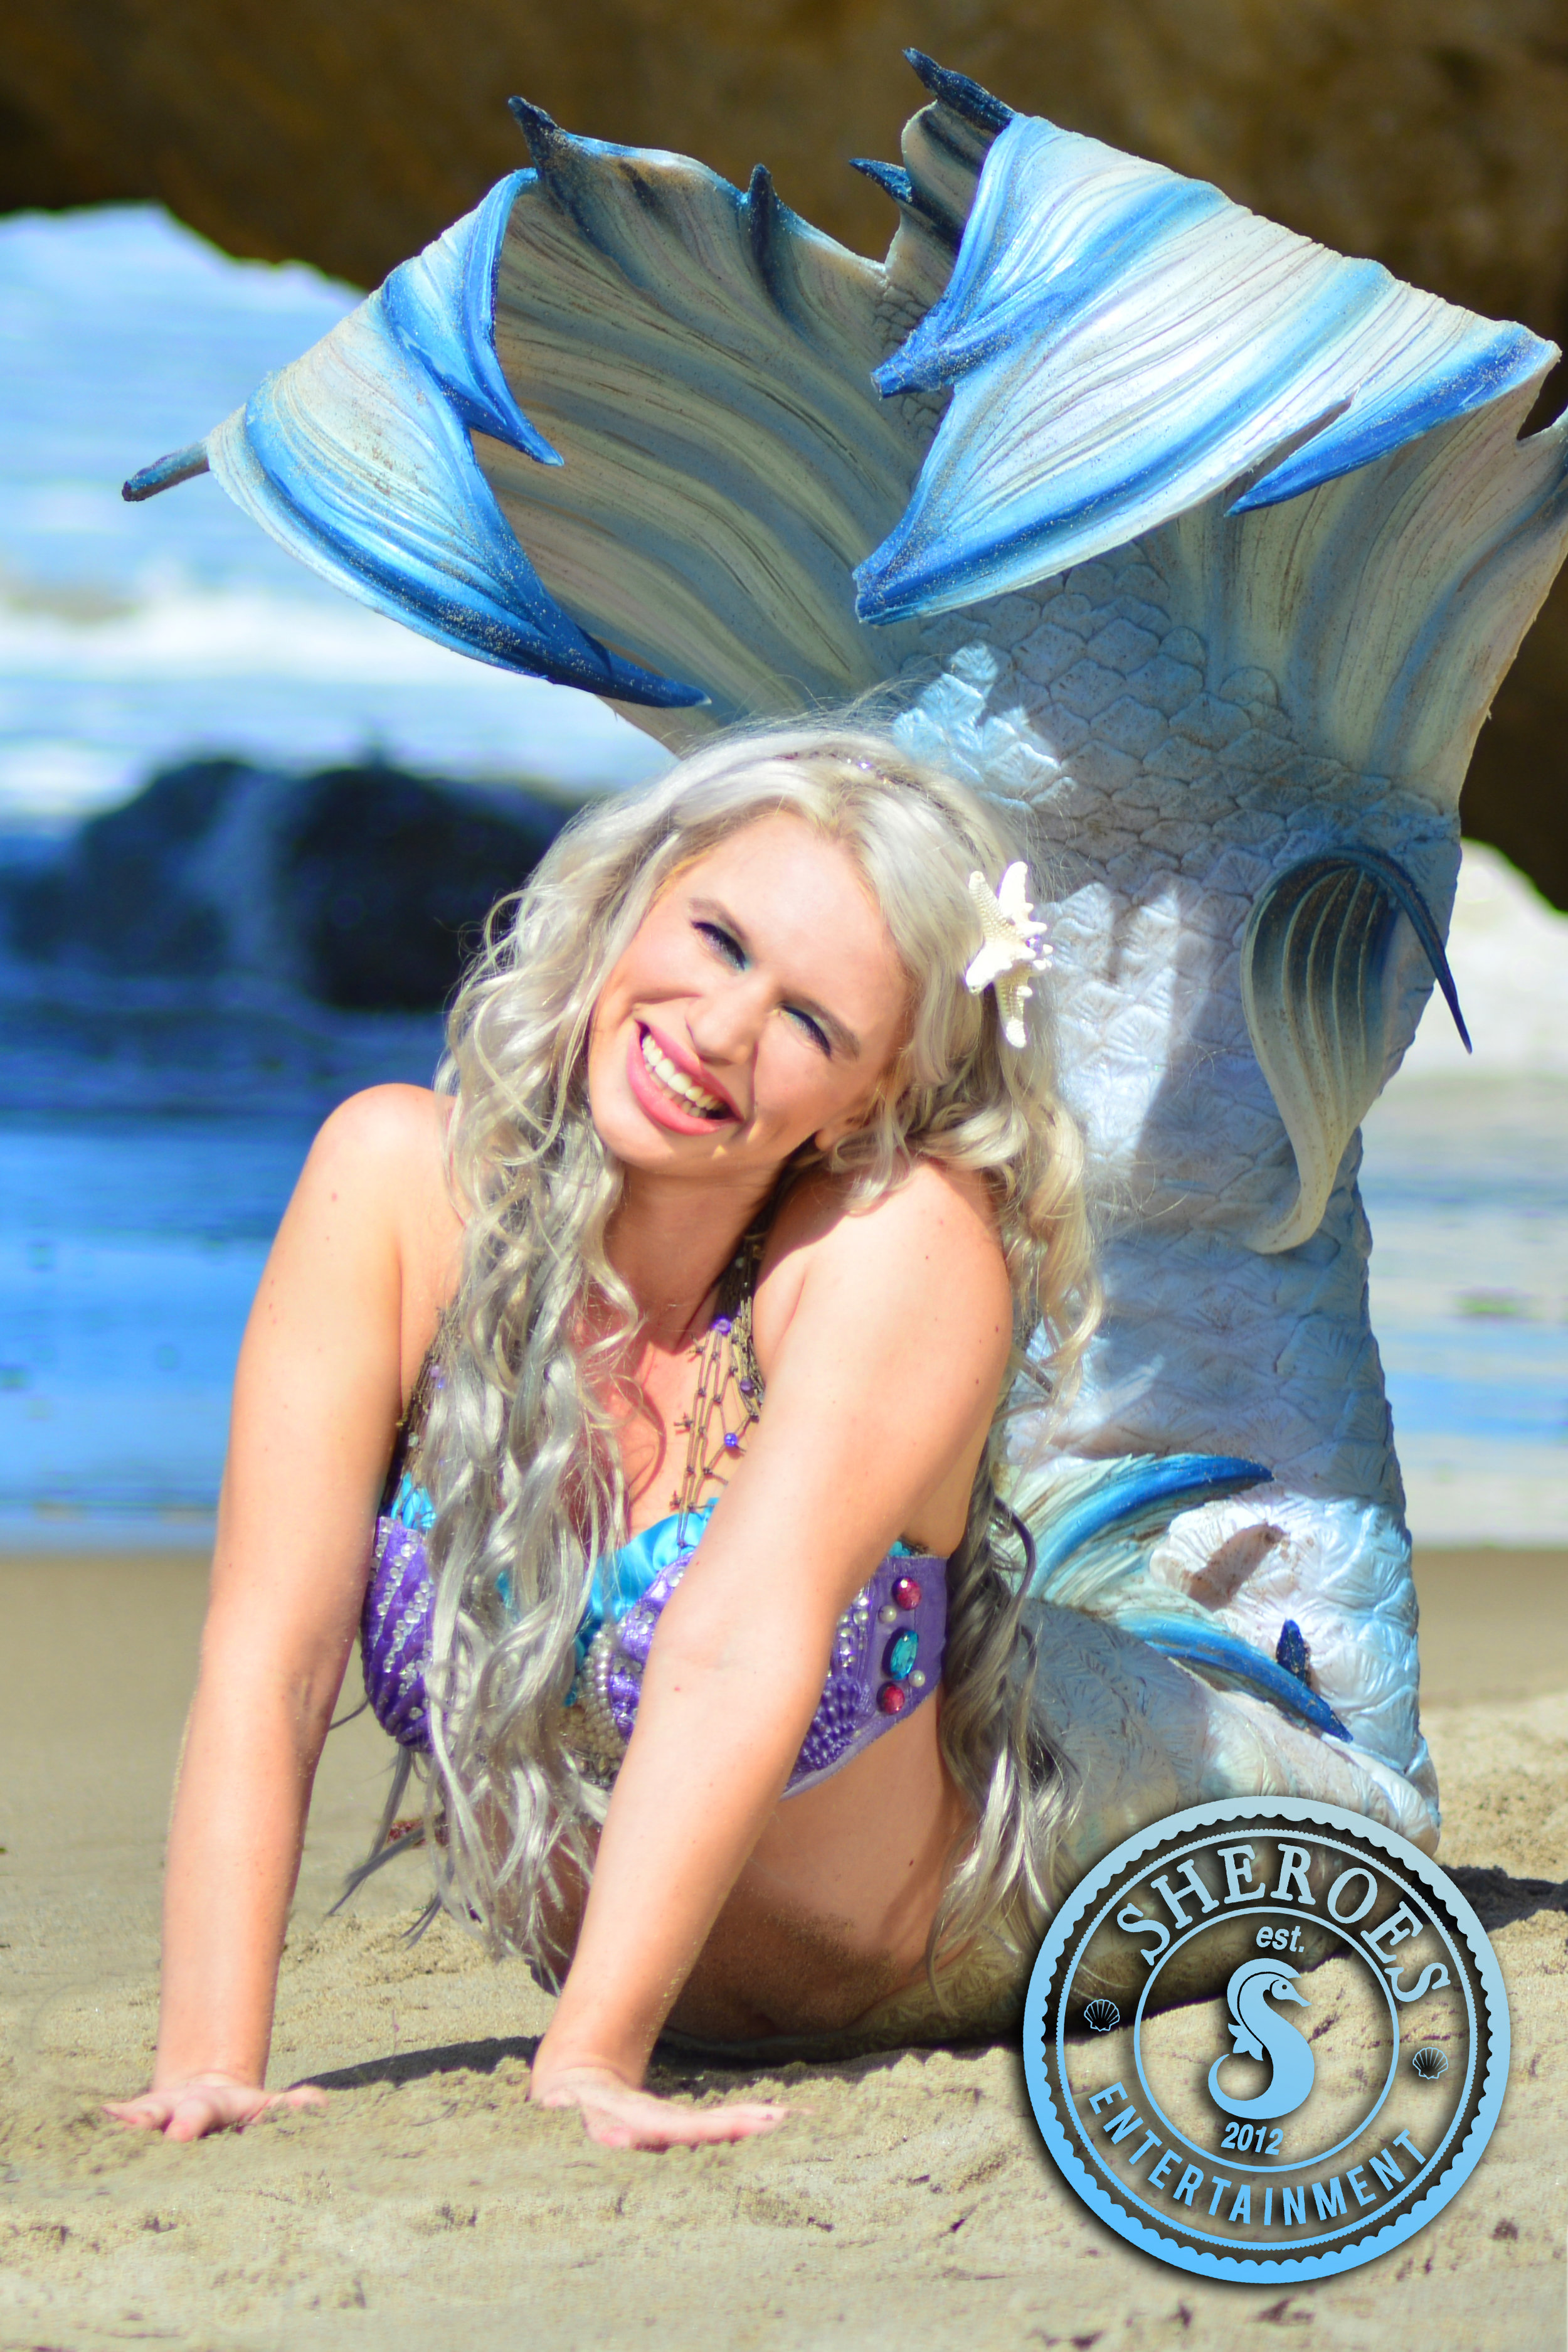 Professional Mermaid Splash Downtown Los Angeles